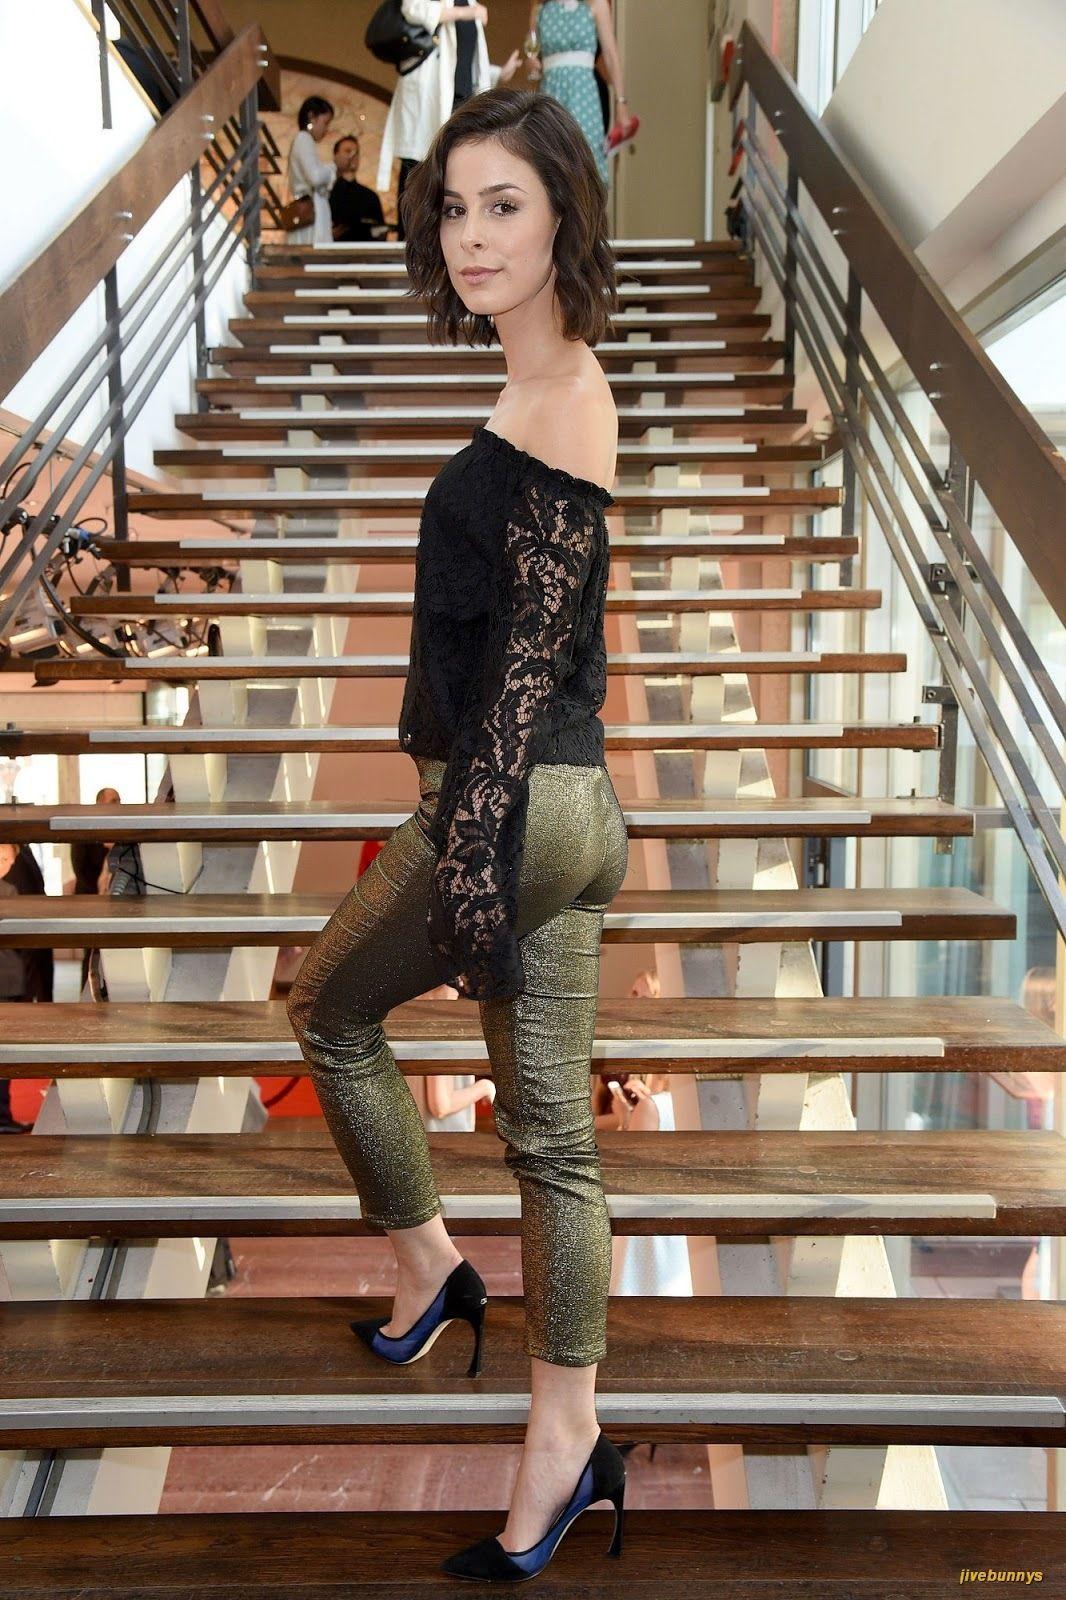 Feet Lena Meyer Landrut nude photos 2019